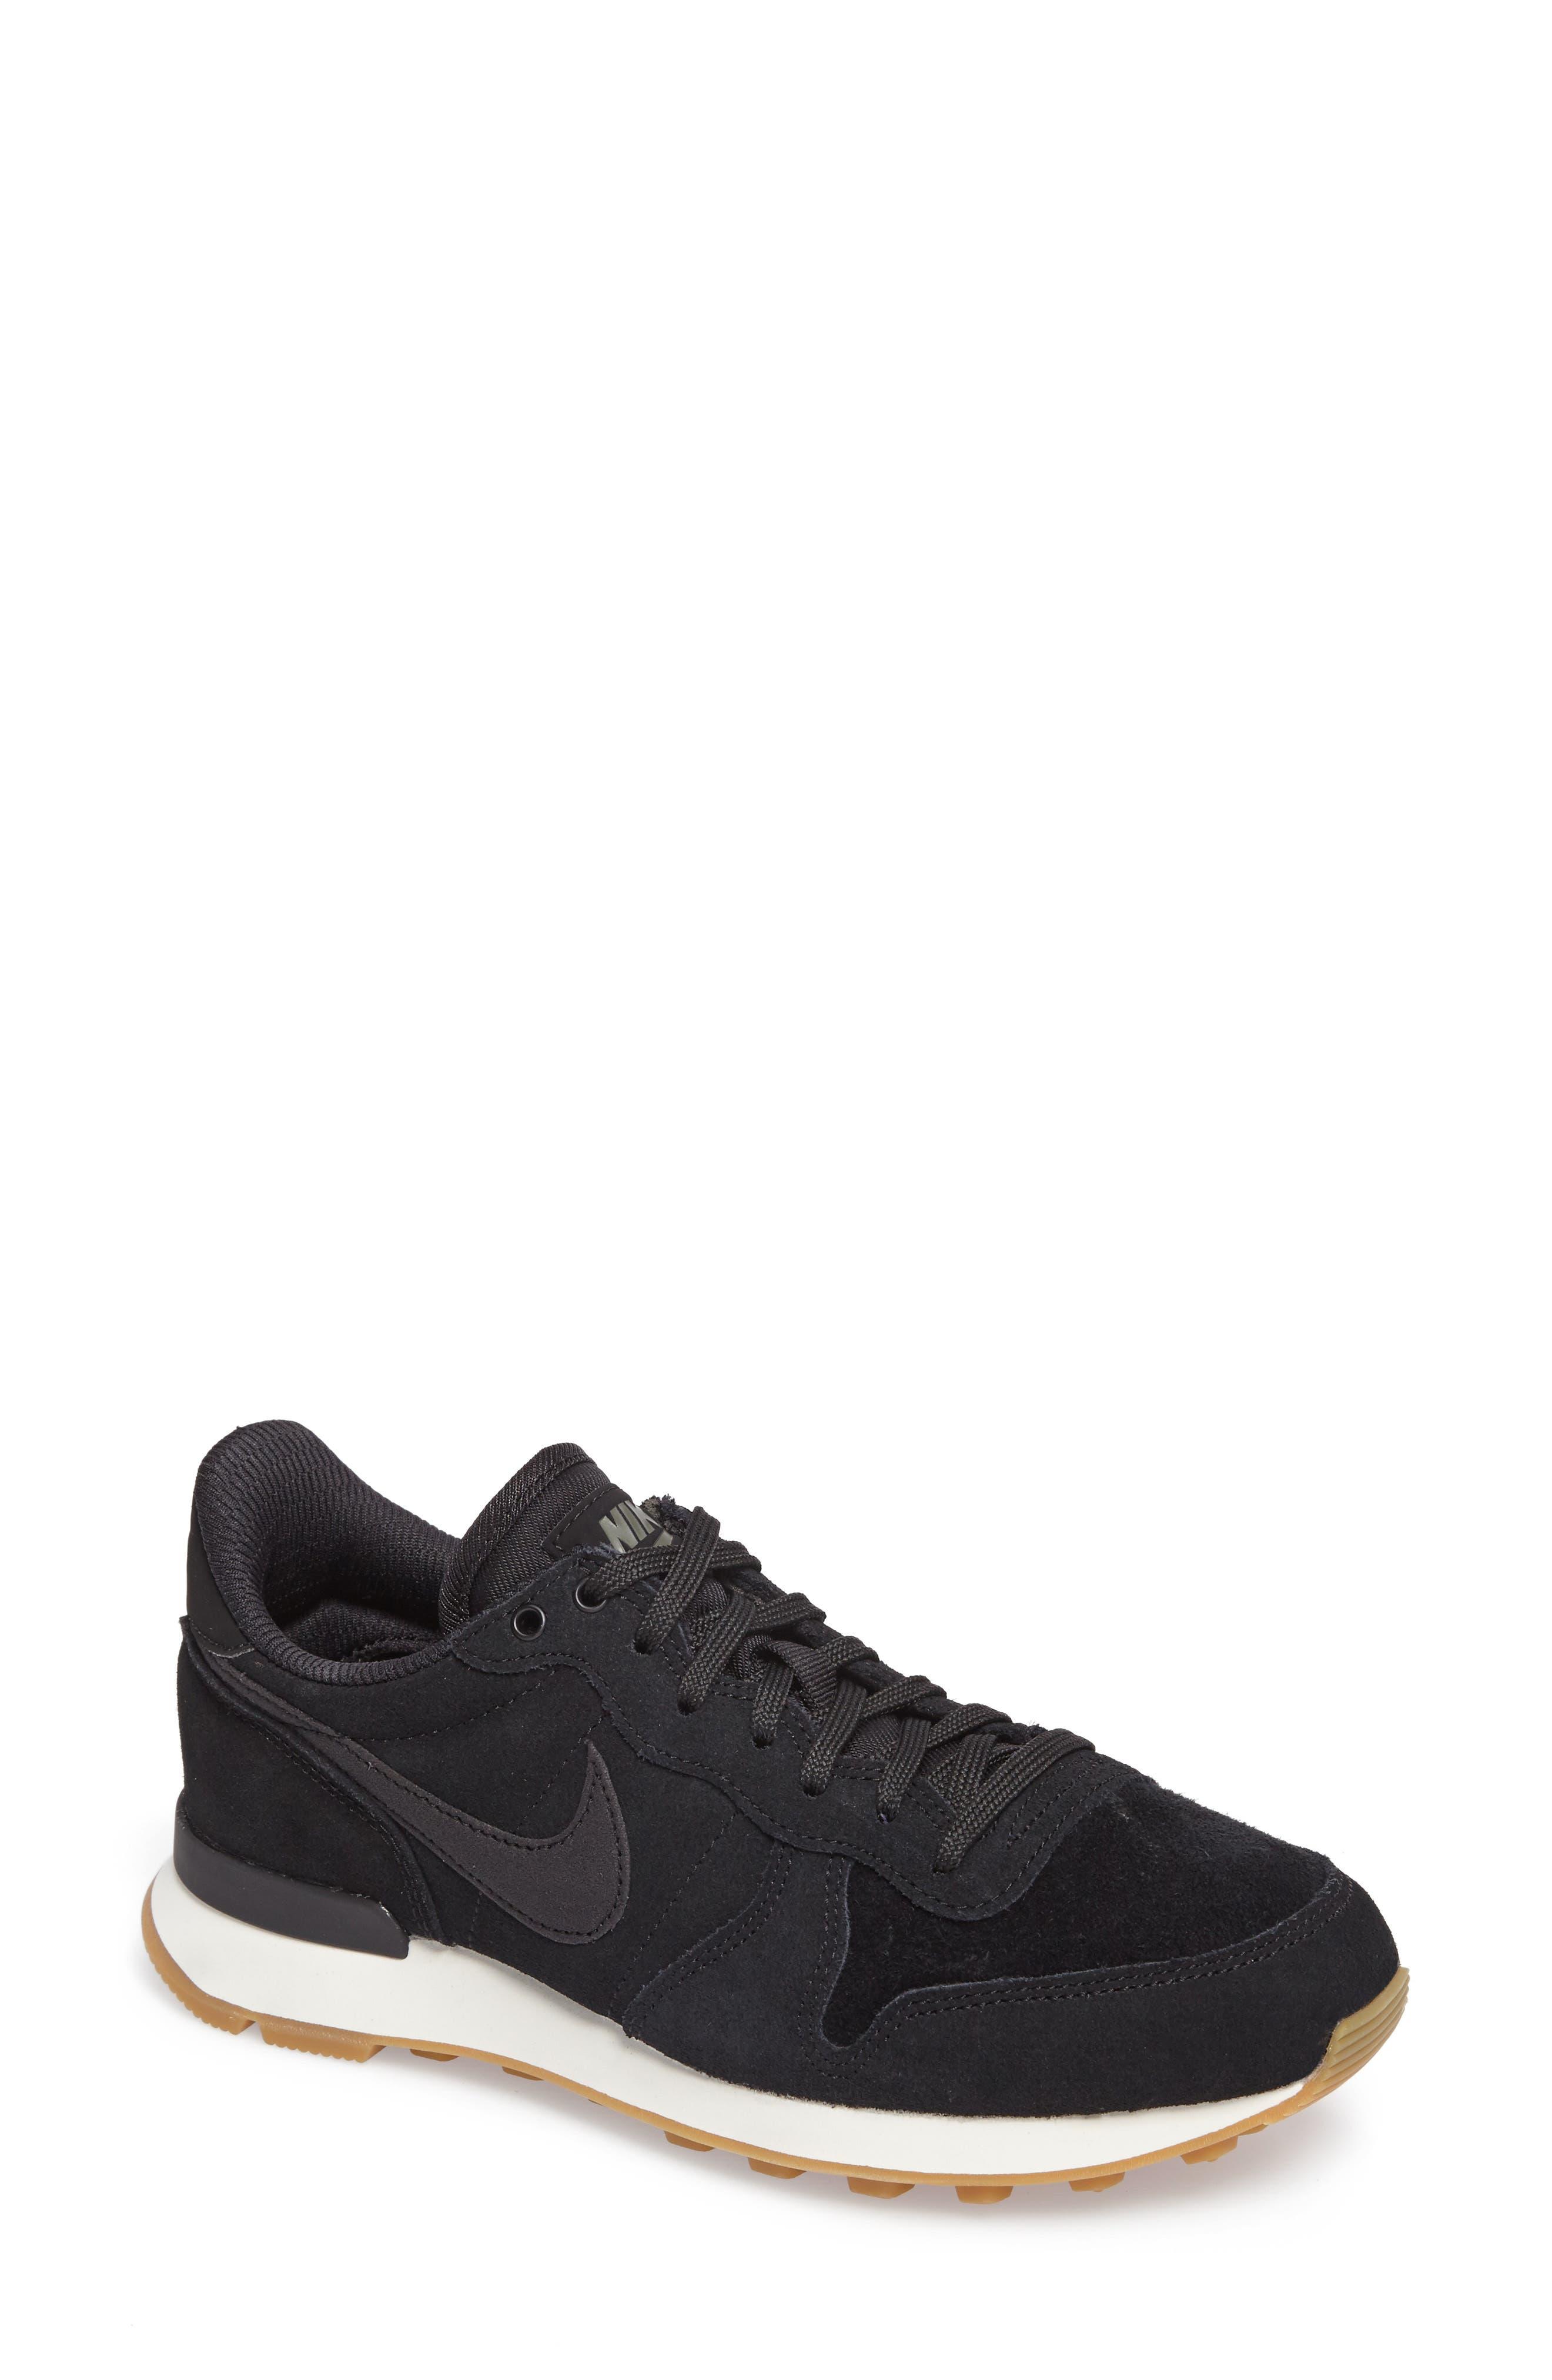 Internationalist SE Sneaker,                         Main,                         color, 002